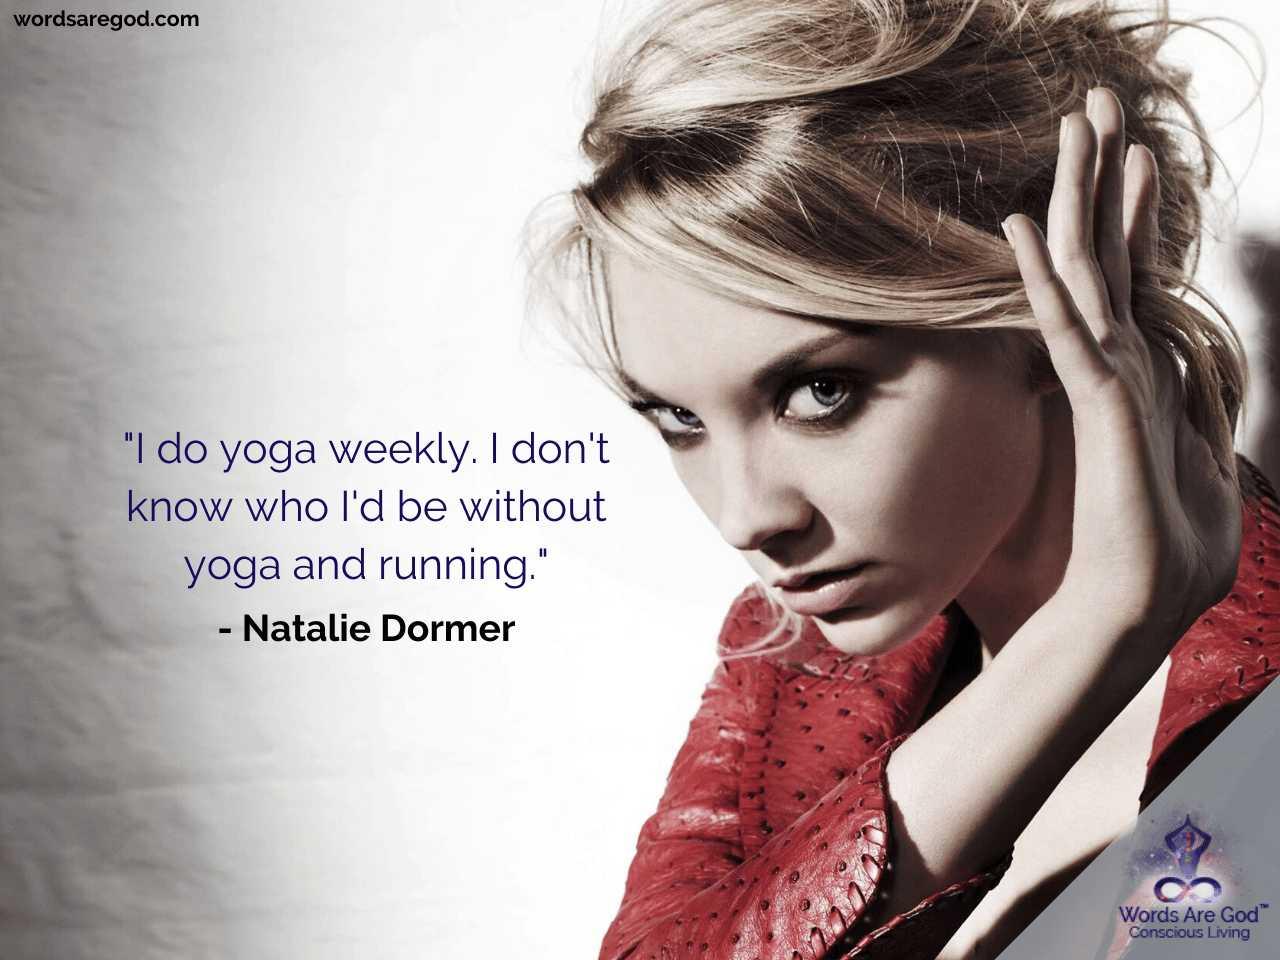 Natalie Dormer Inspirational Quotes by Natalie Dormer